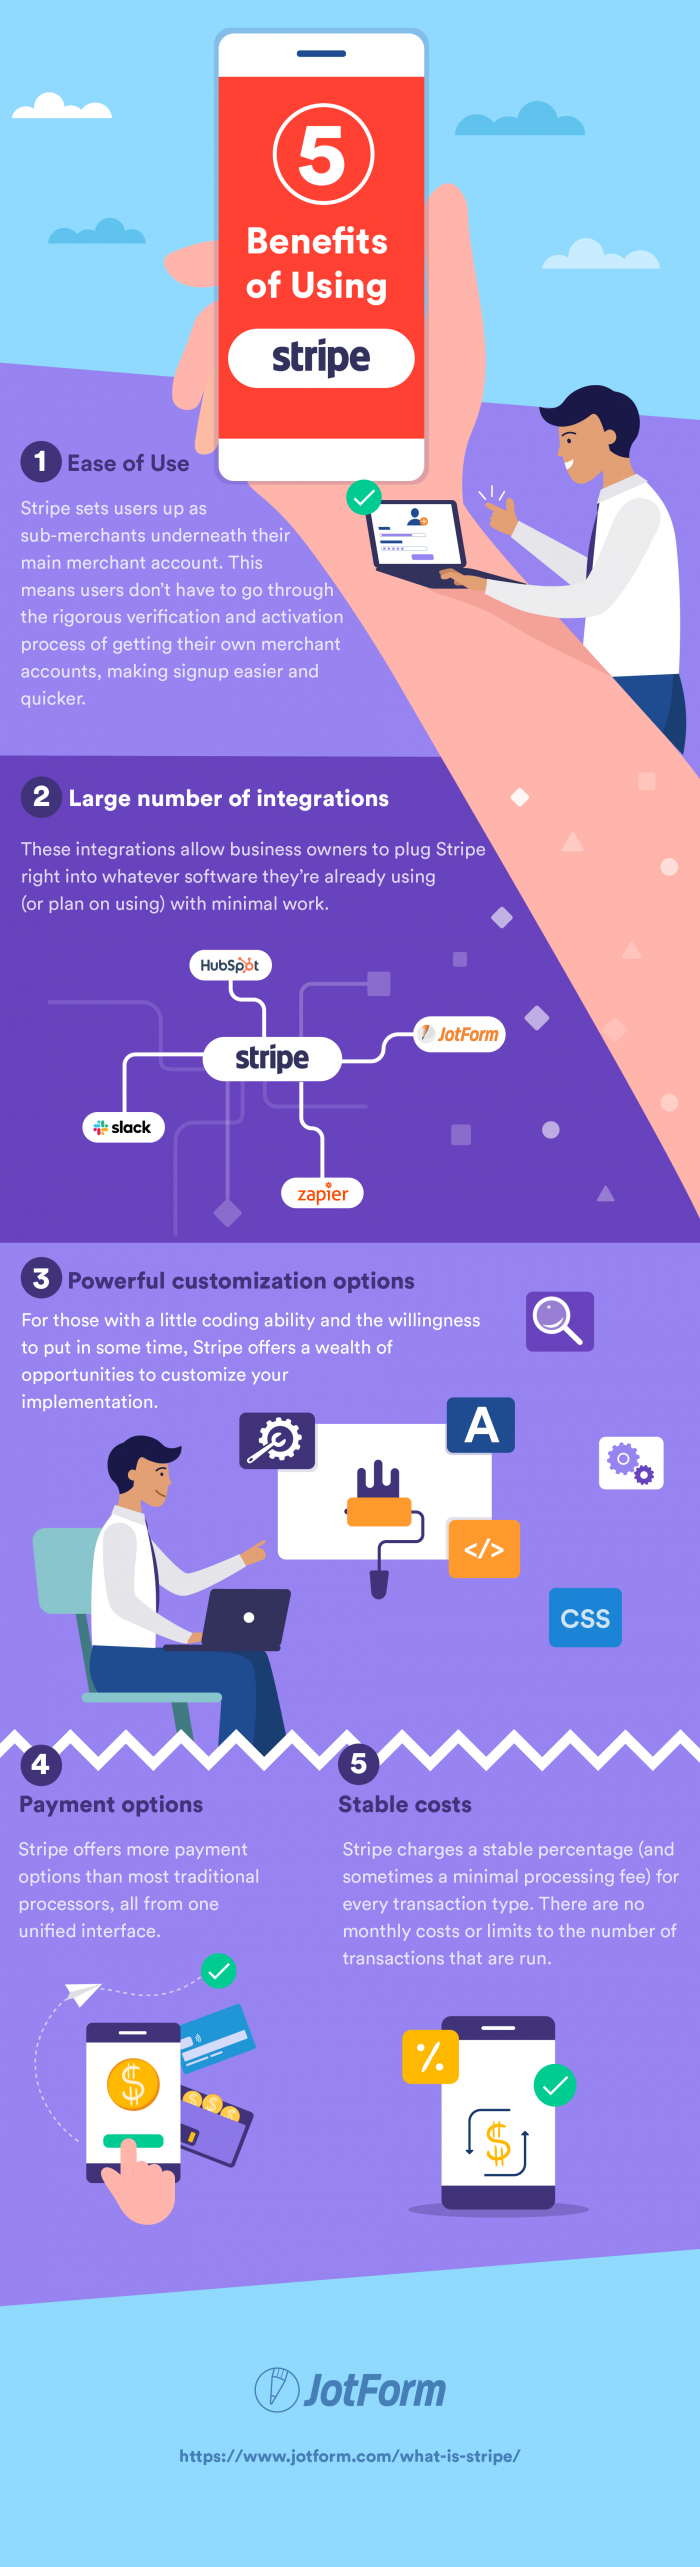 5 benefits of using stripe